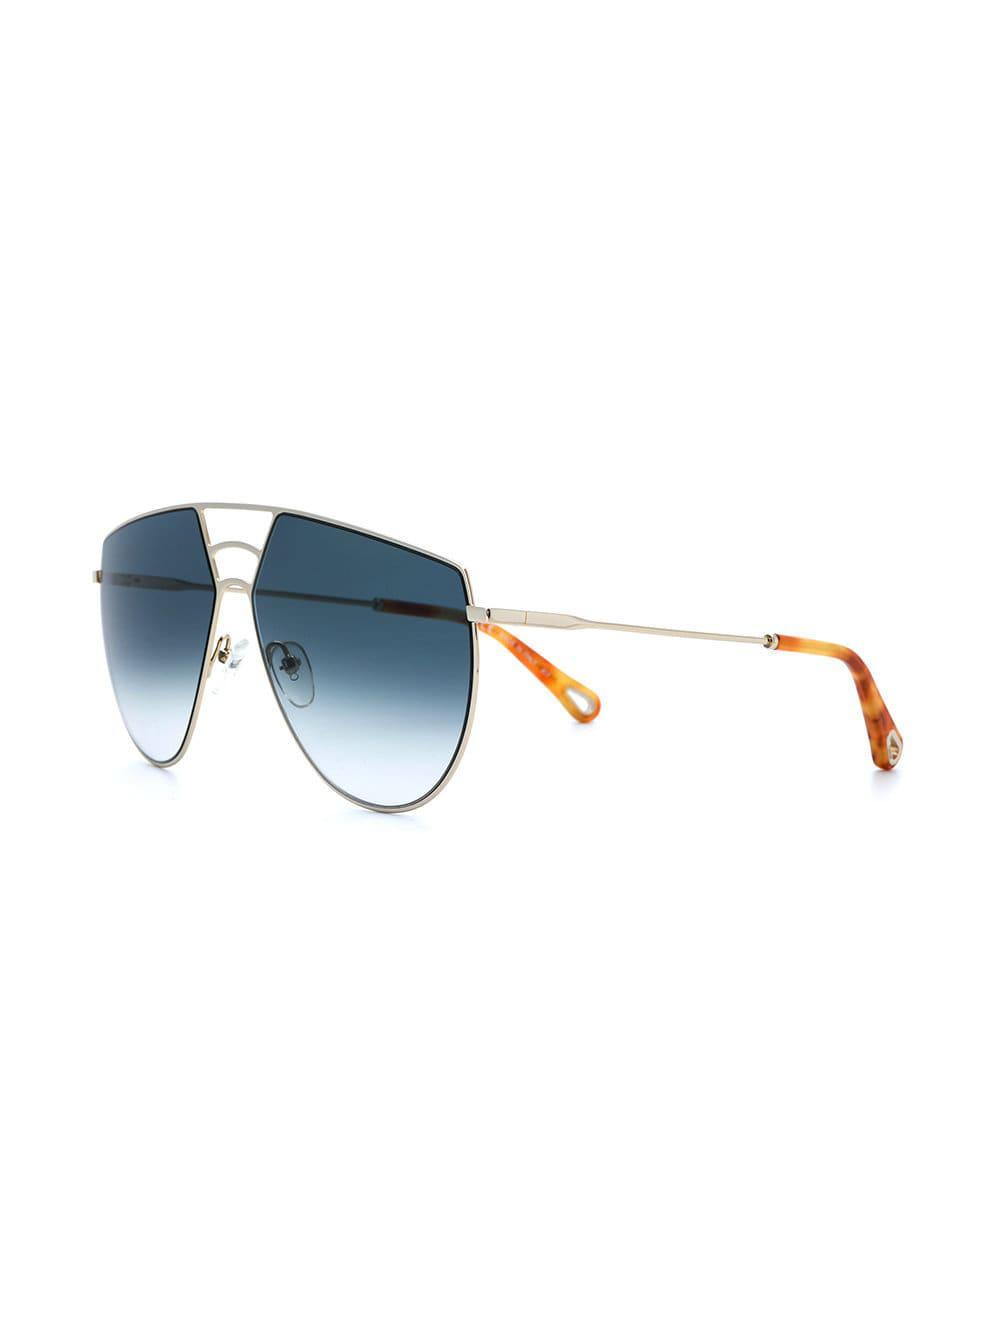 6a740dff5b Lyst - Gafas de sol Ricky Chloé de color Azul